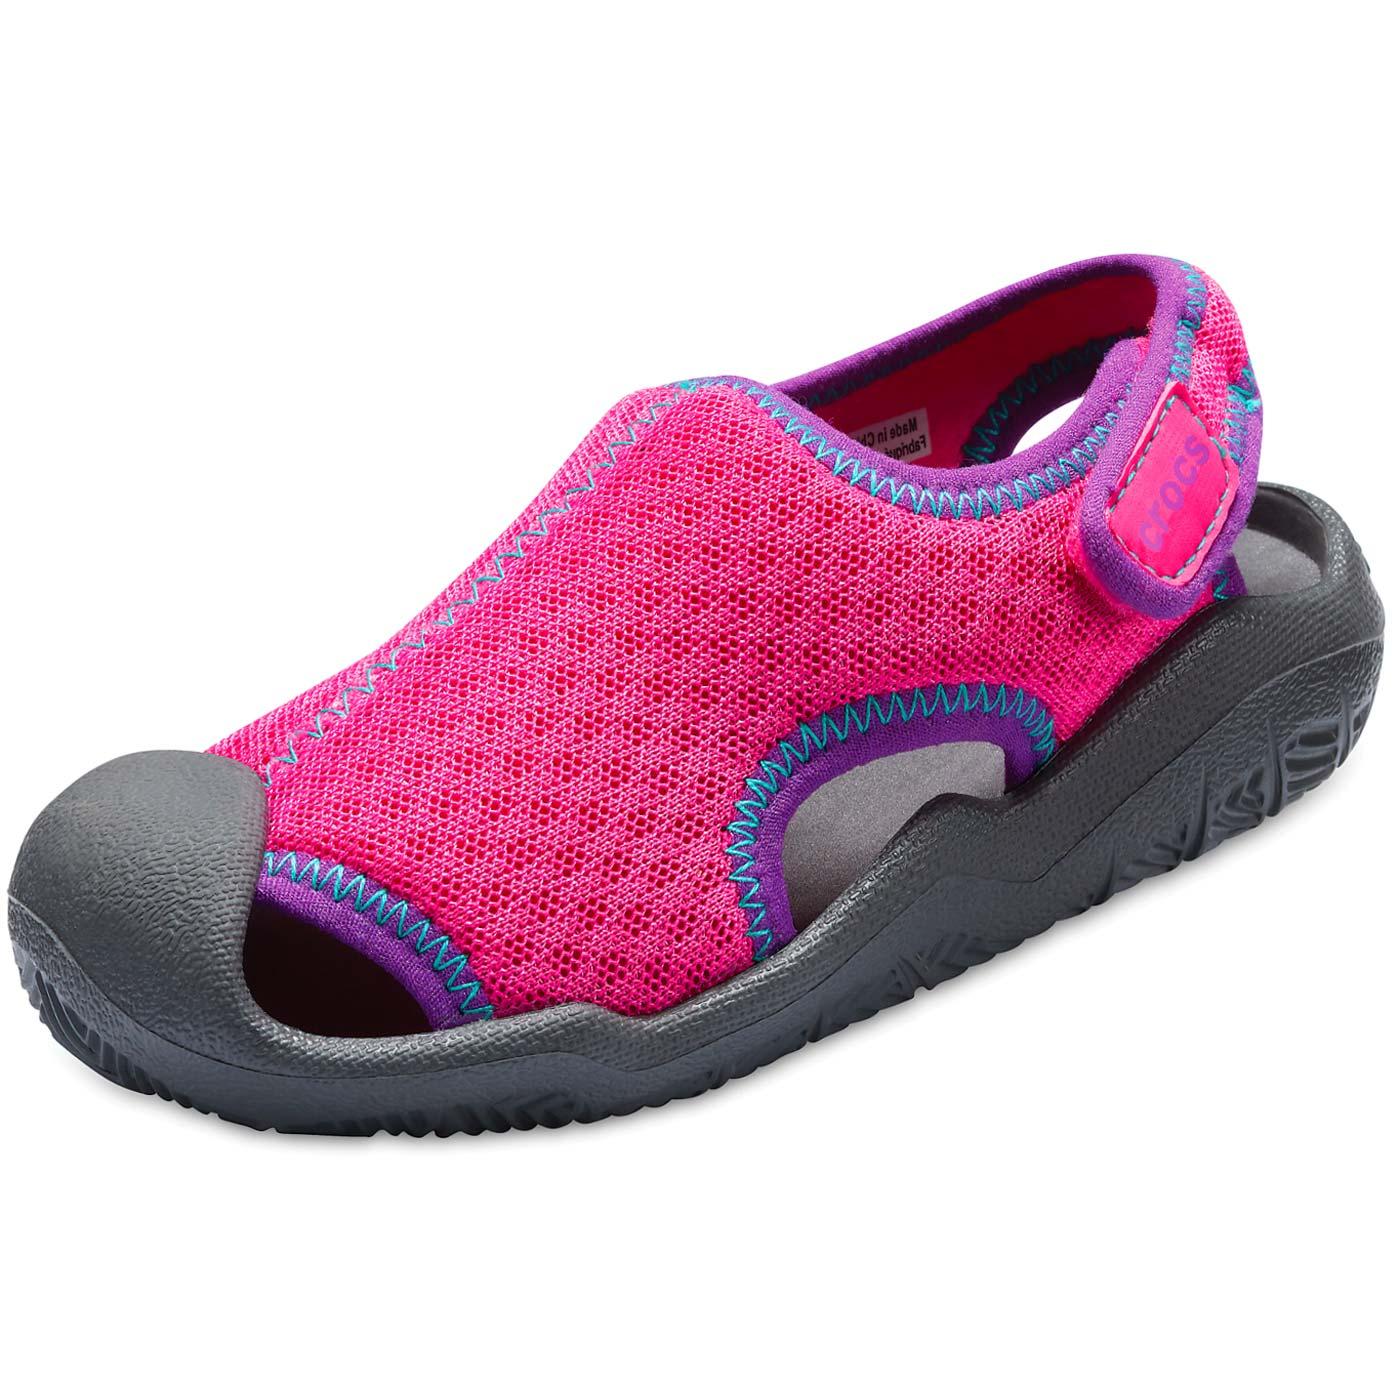 Crocs Swiftwater Sandal Kids Girl Aqua Shoes neon magenta/slate grey    Sandals   Kids   Flux Online